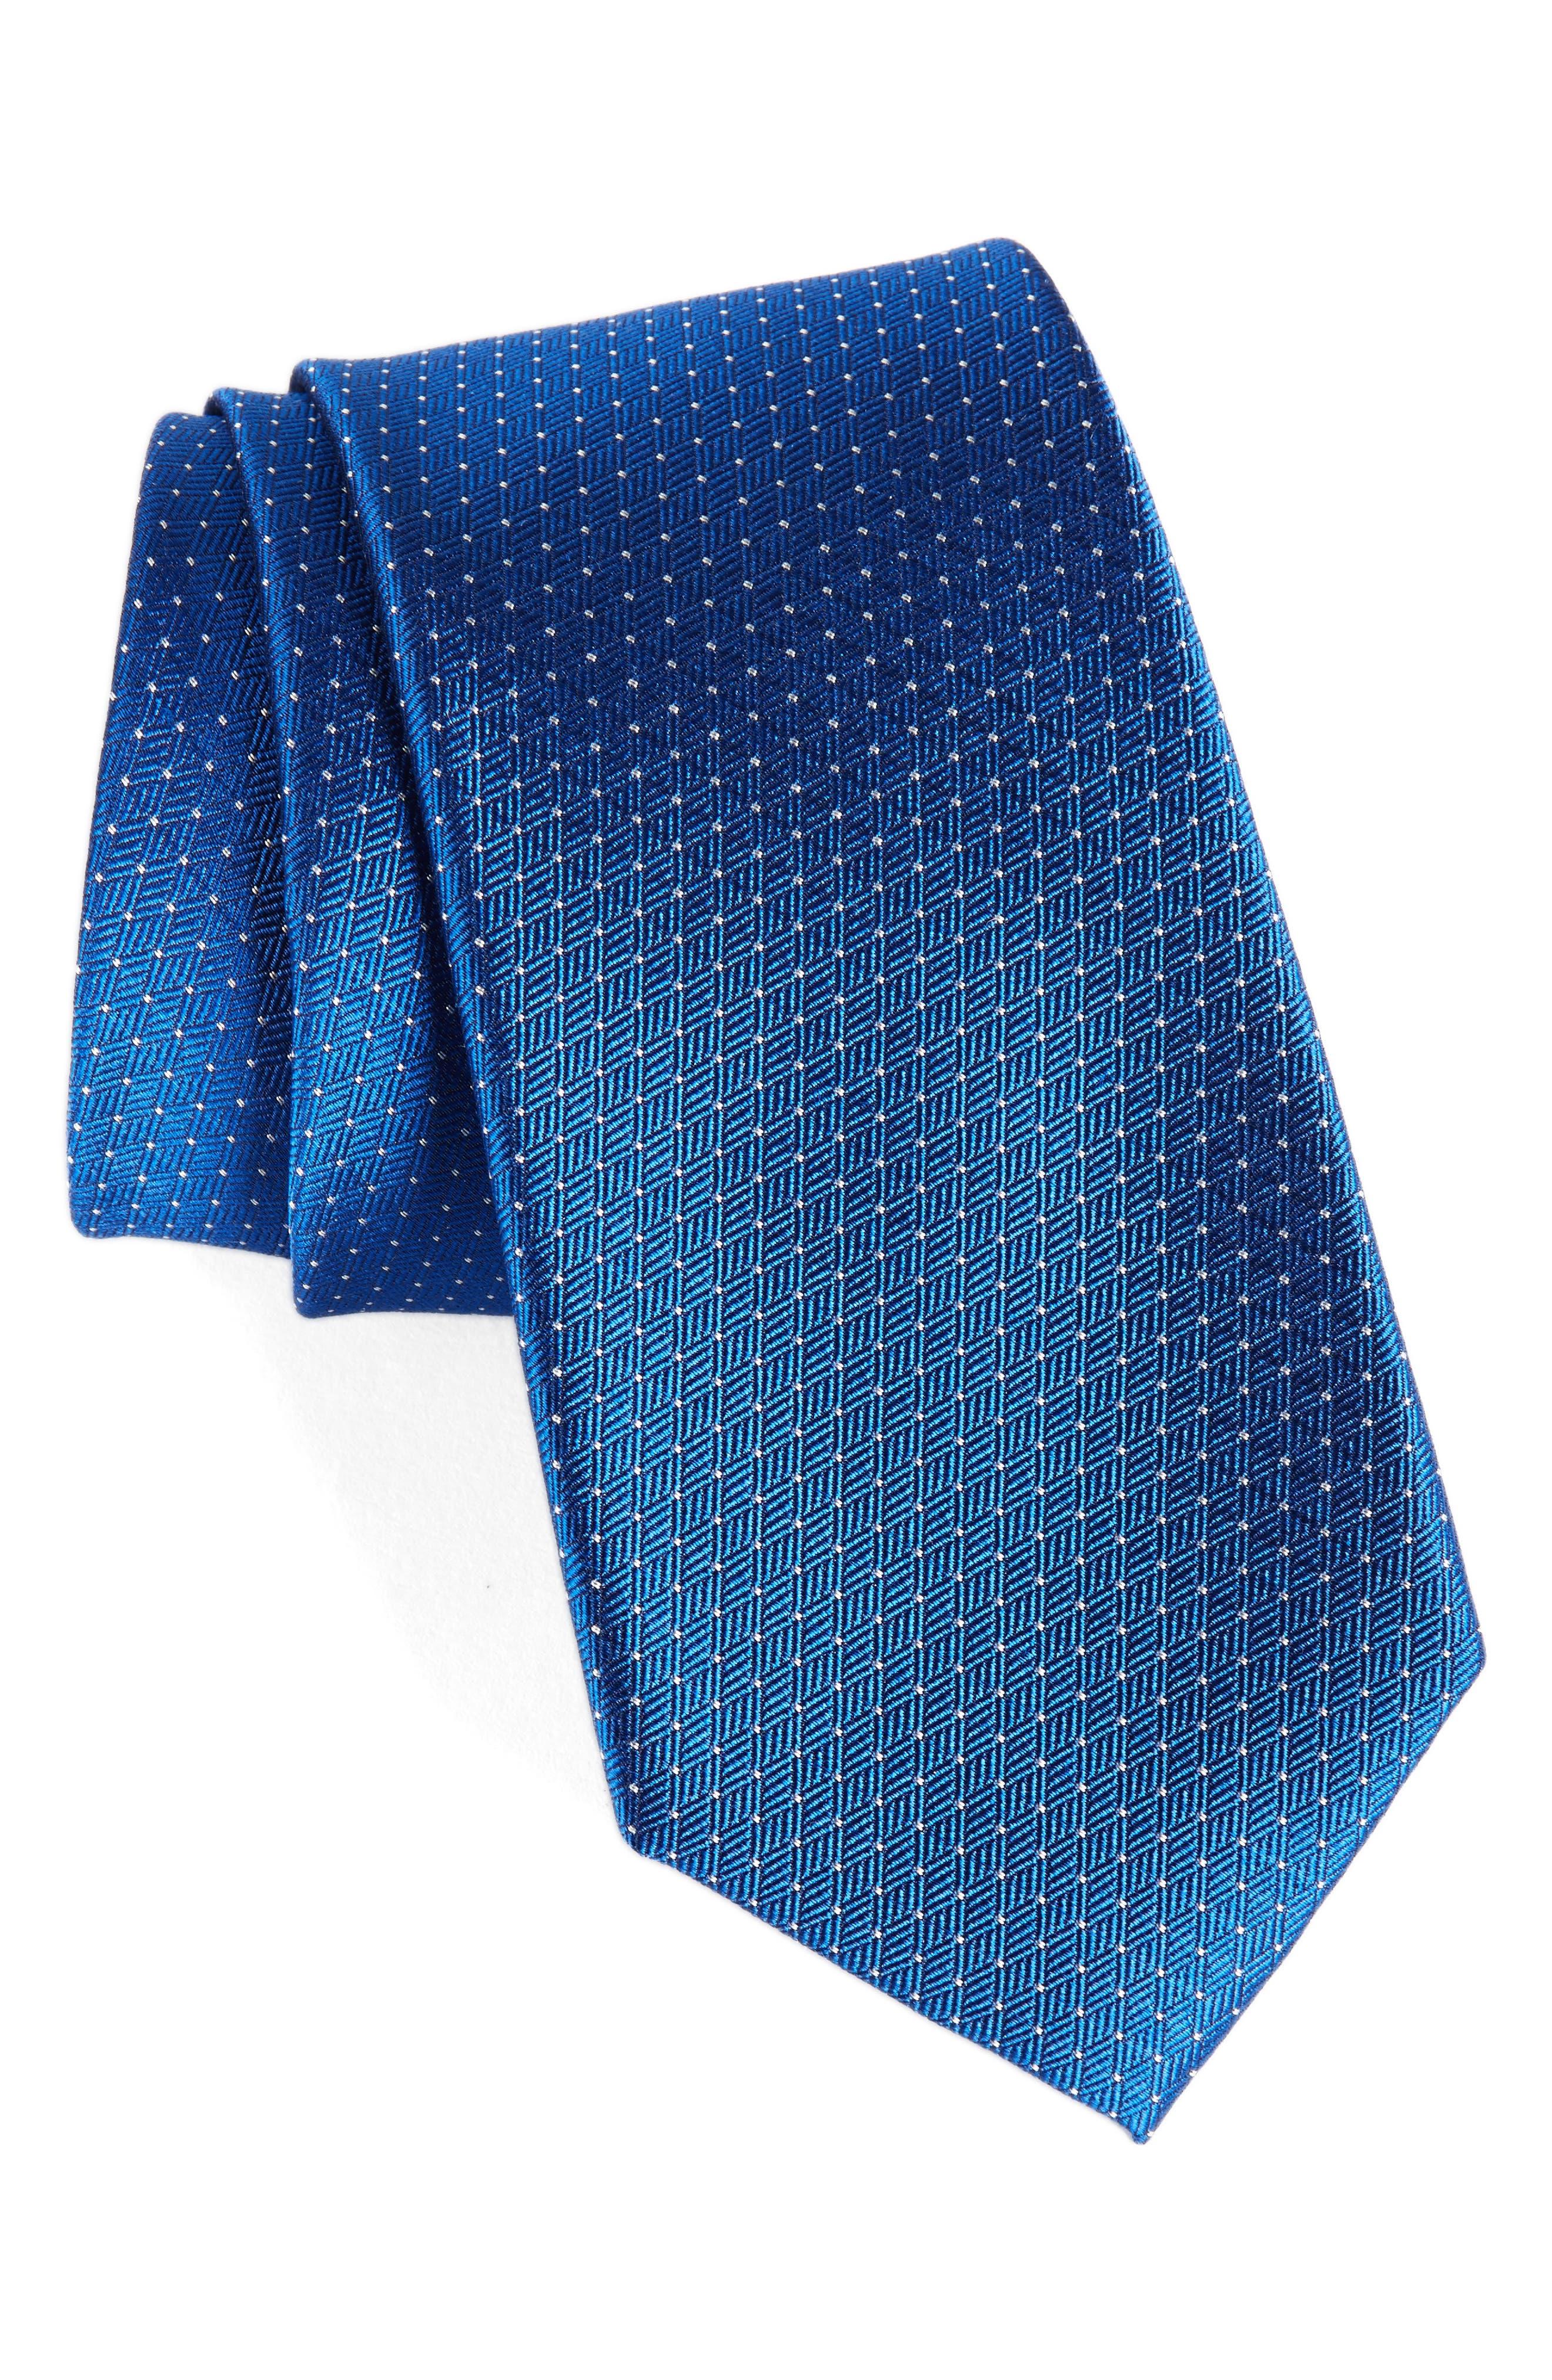 Main Image - Nordstrom Men's Shop Parquet Pin Dot Silk Tie